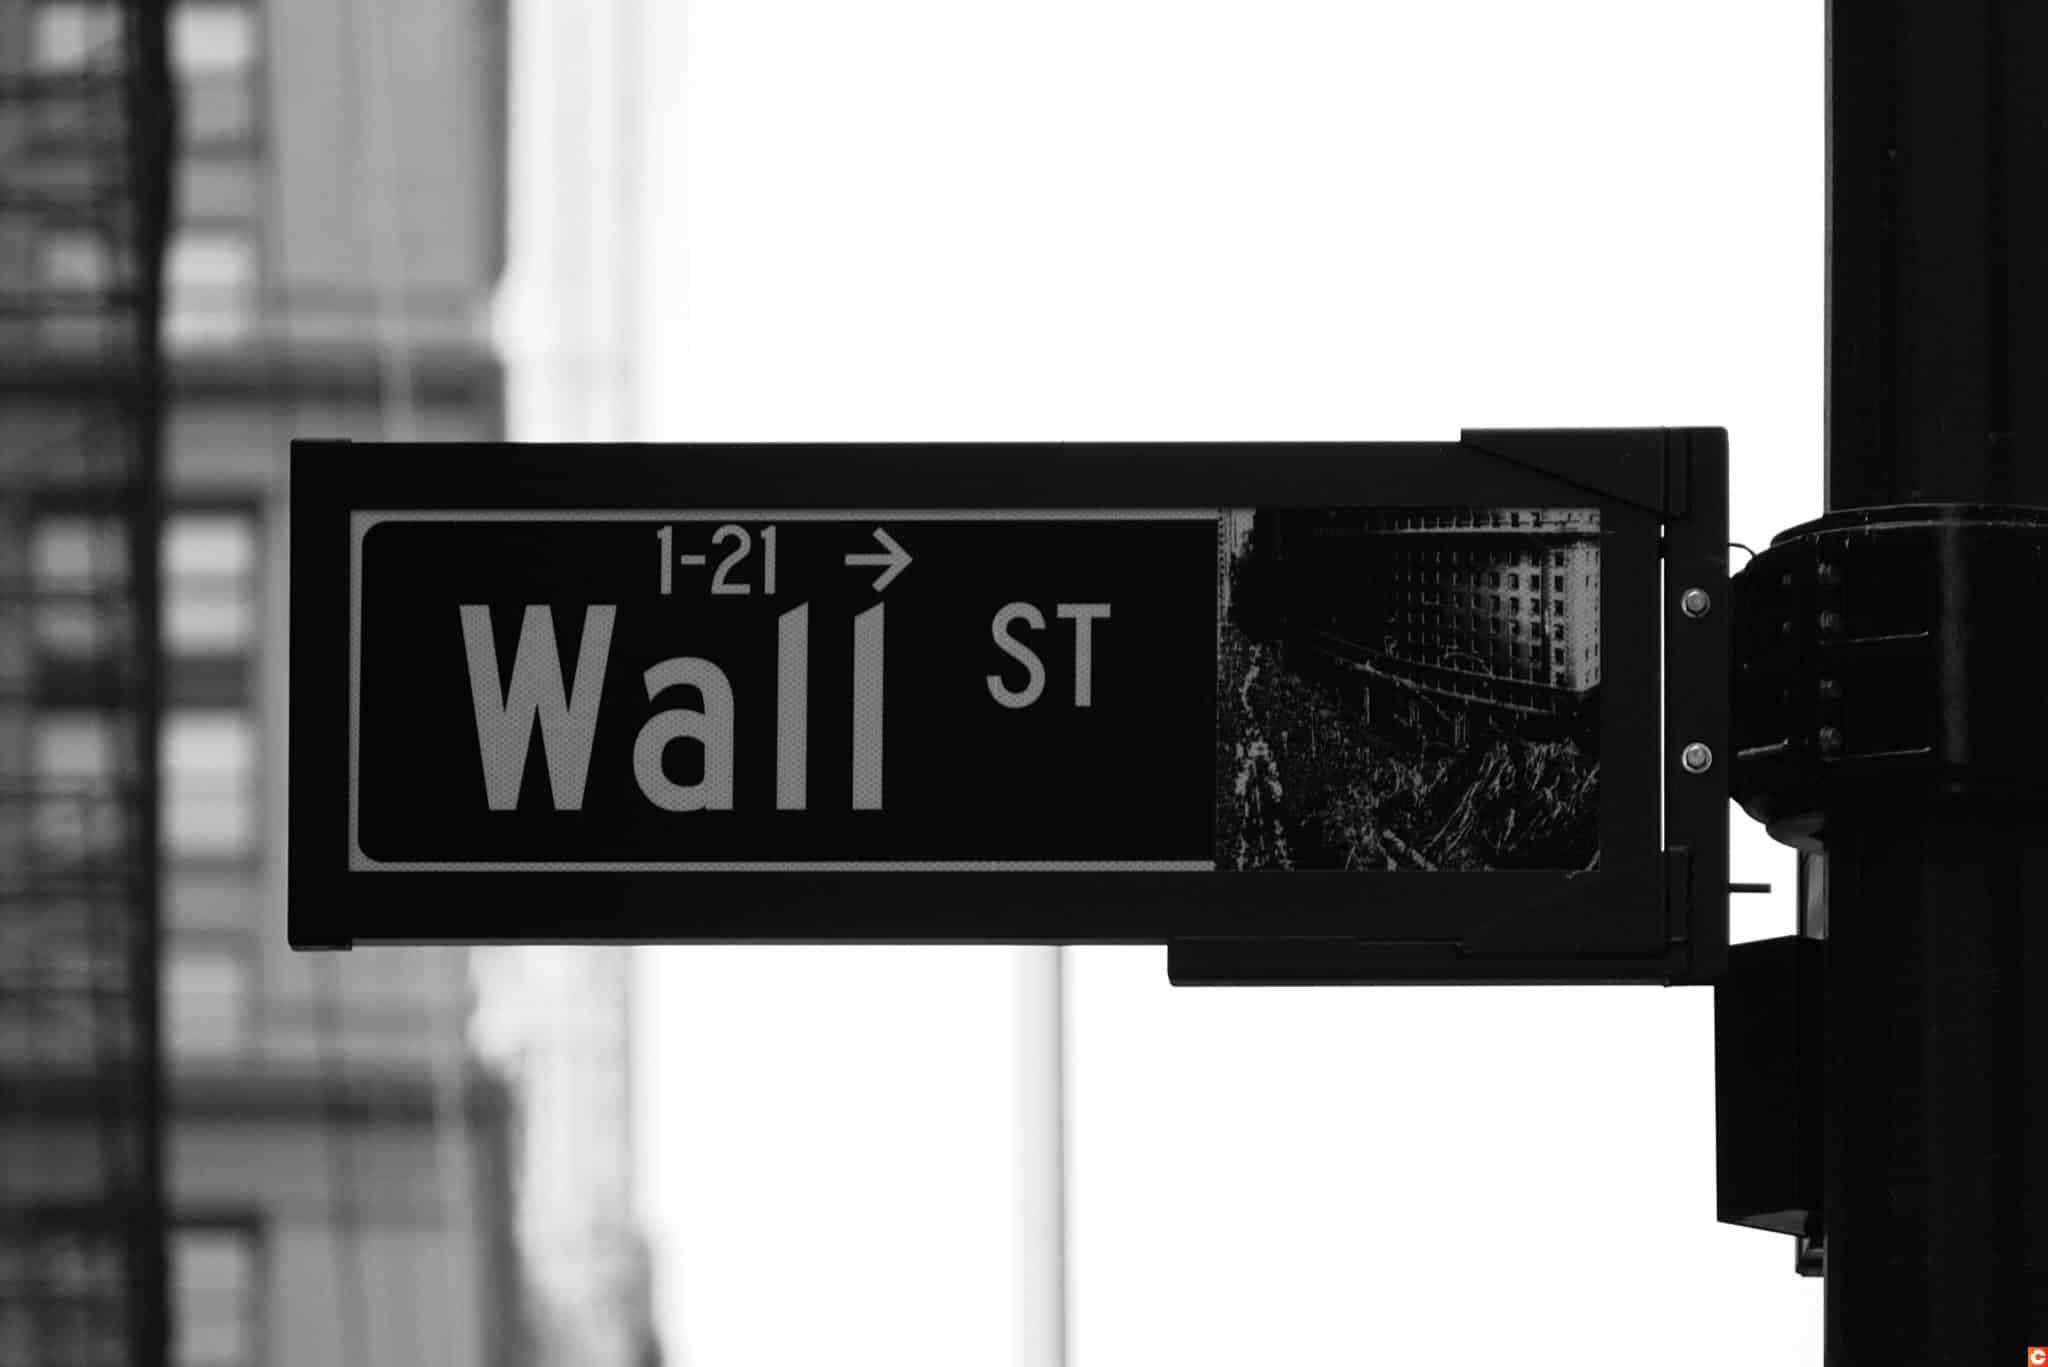 Meet me on Wall St